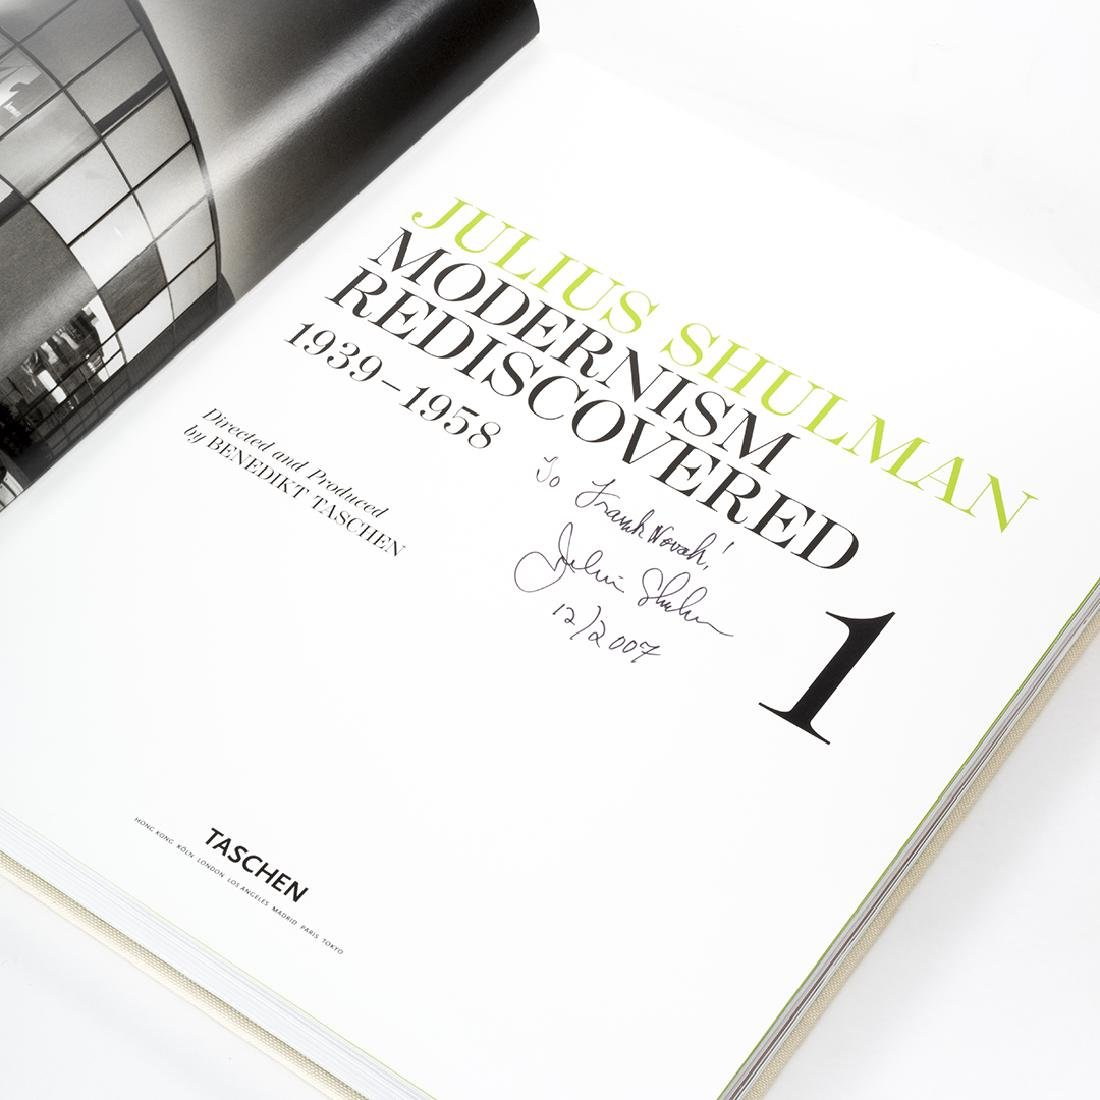 Julius Shulman Modernism Rediscovered Boxed Set - 2